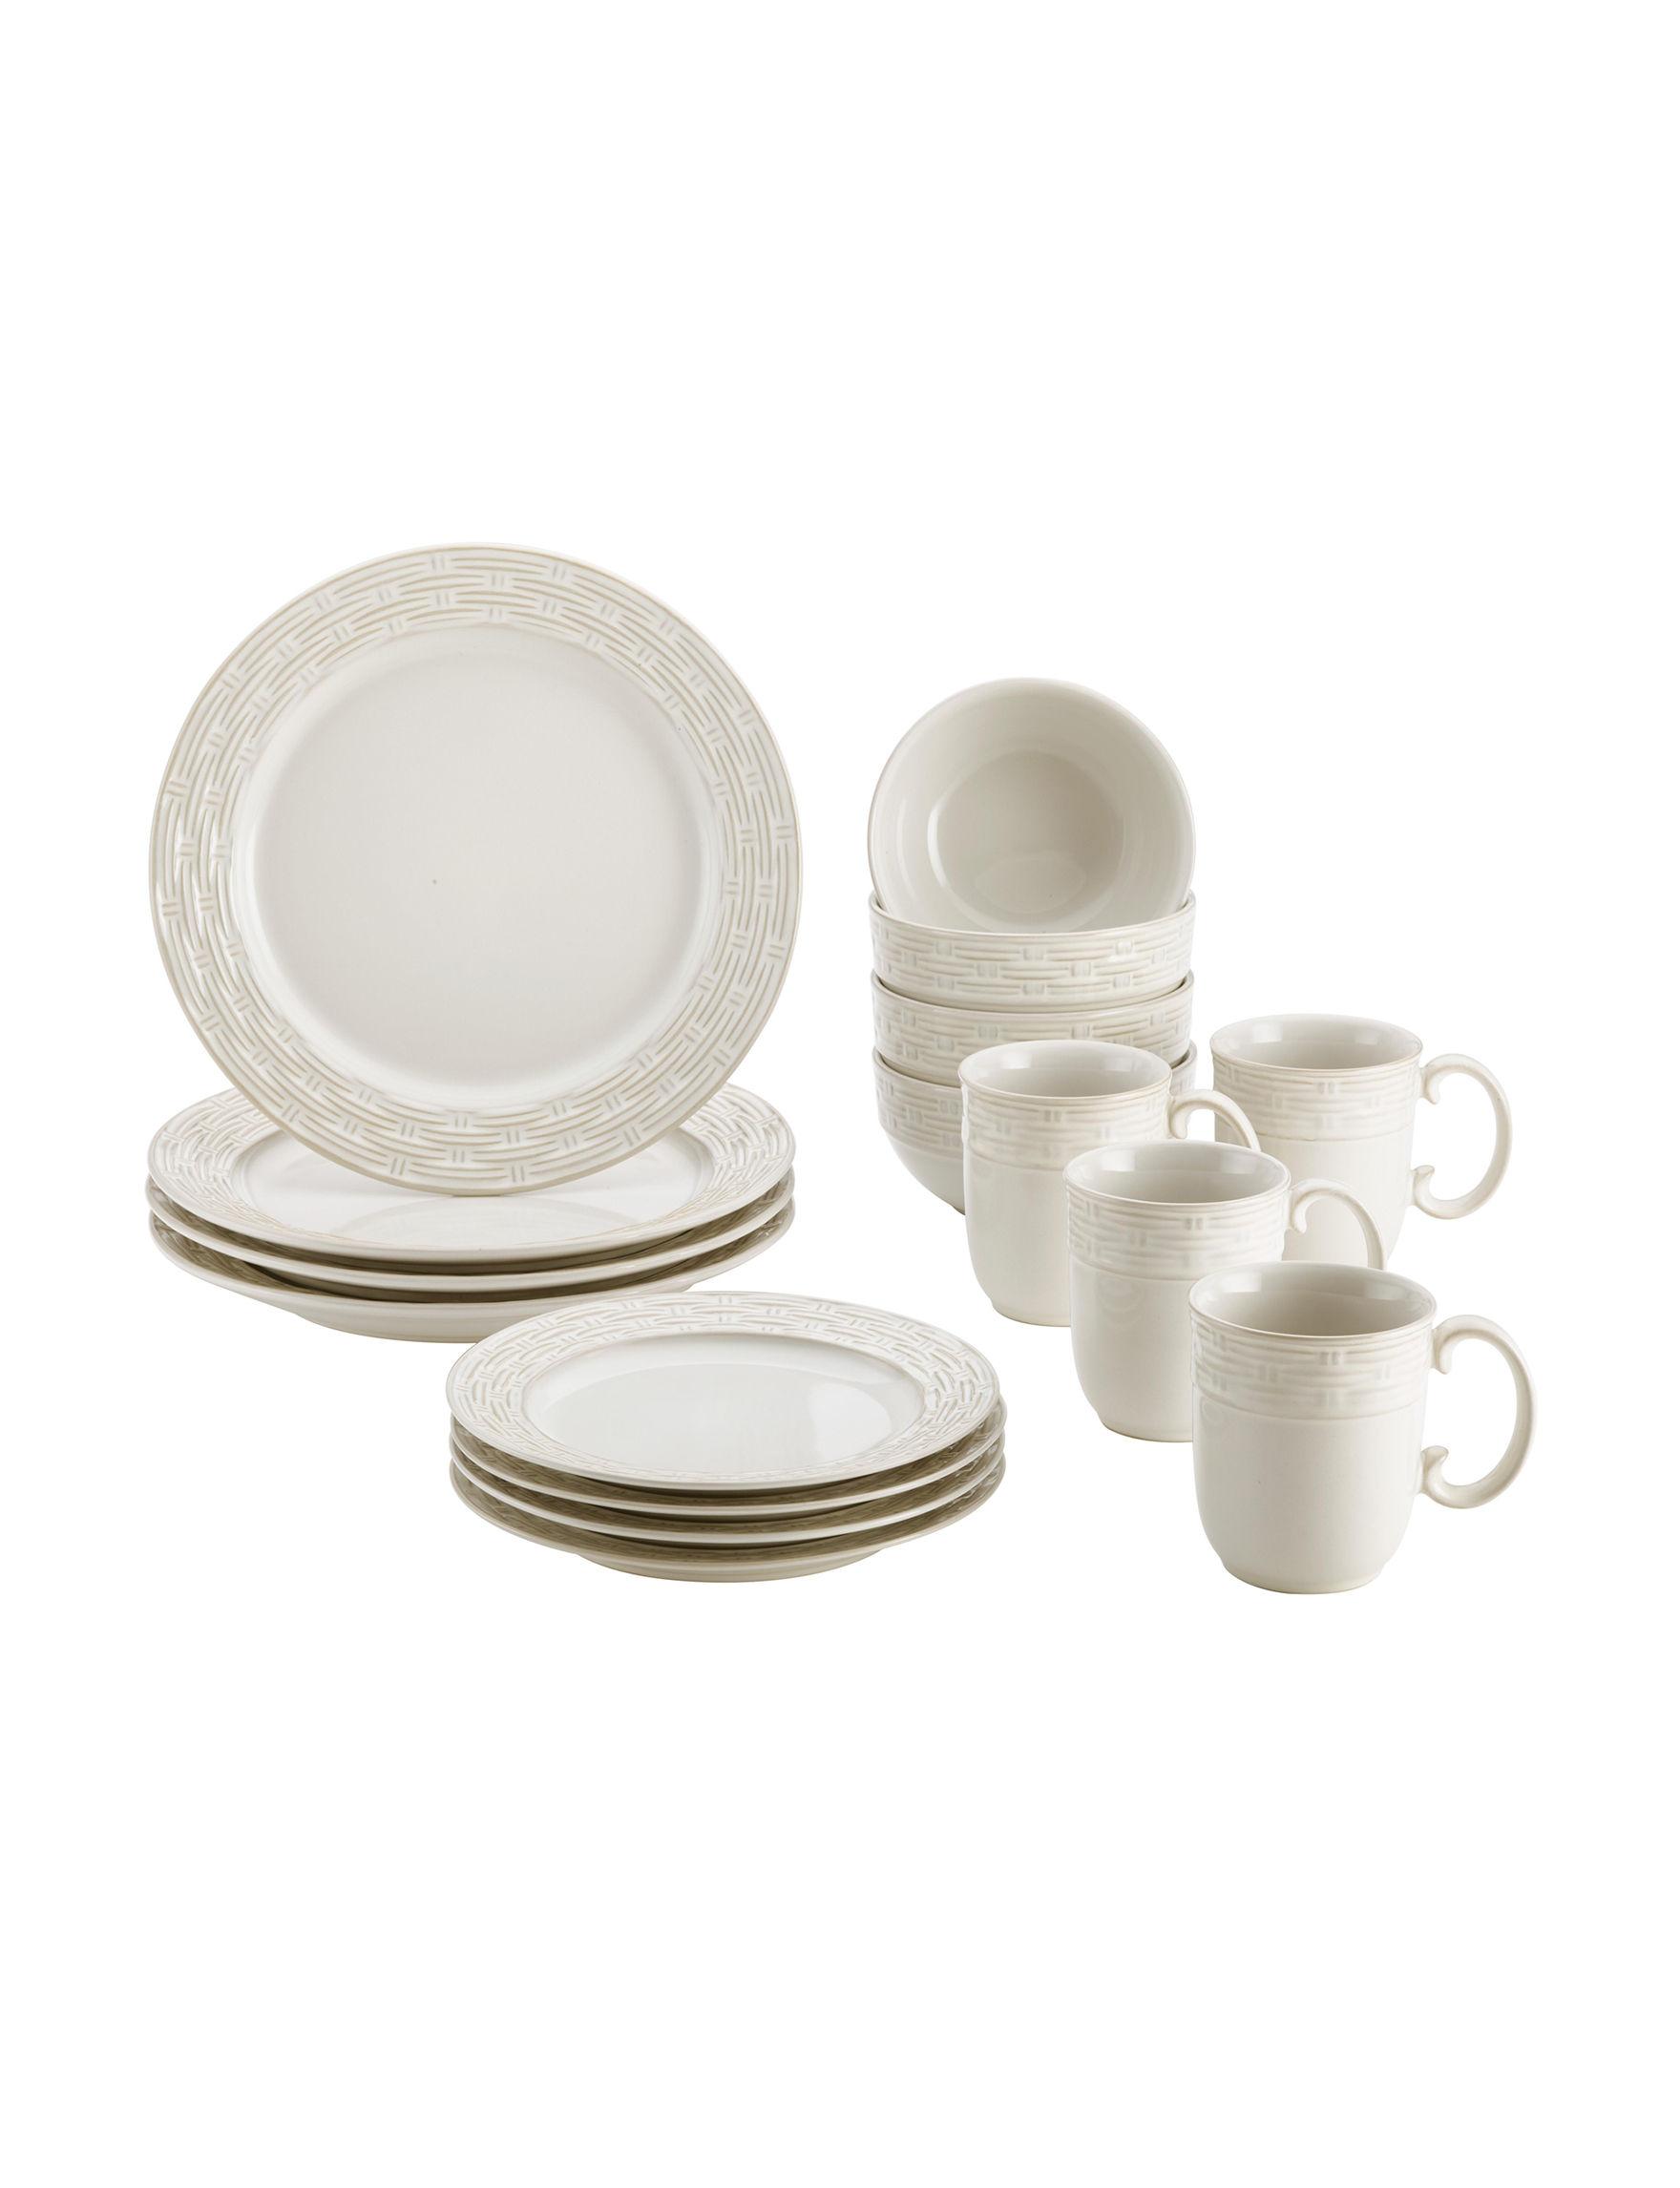 Paula Deen Cream Dinnerware Sets Dinnerware